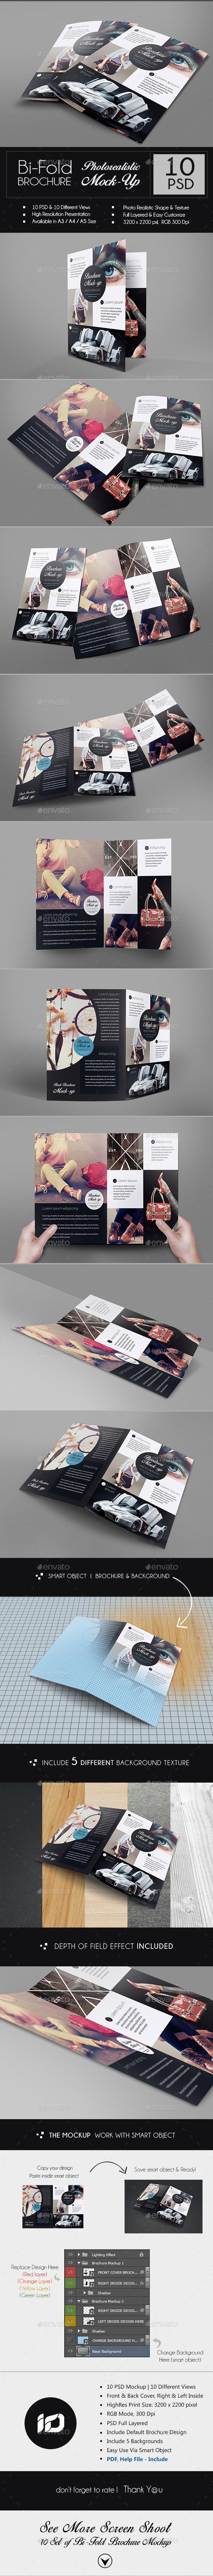 GraphicRiver Realistic A4 A3 Bi-Fold Brochure Mock-Up 9090406